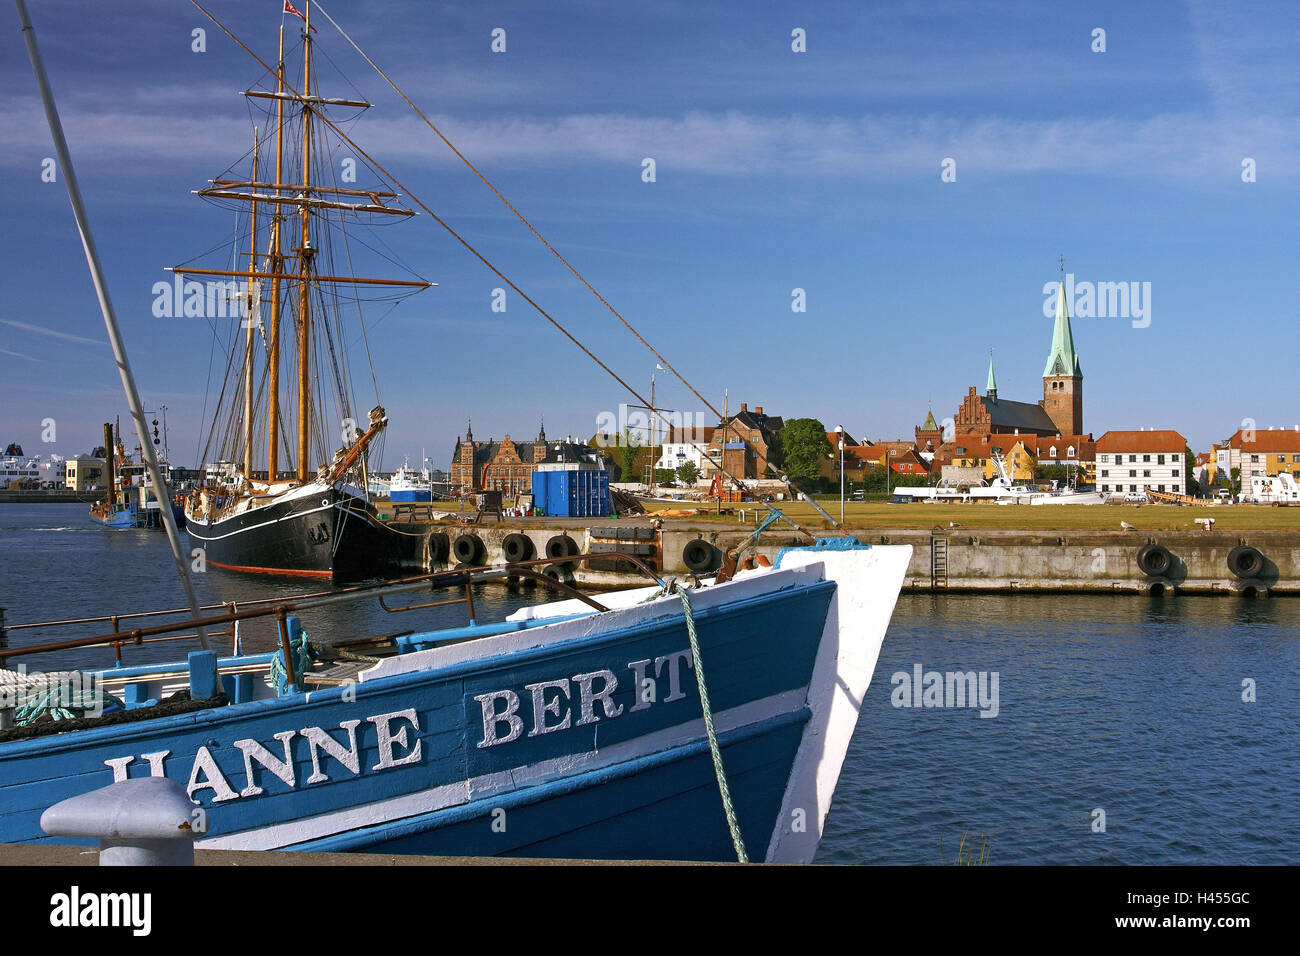 Denmark, Helsingoer, fishing trawler, fishing harbour, sailing ship, Old Town centre, church, - Stock Image